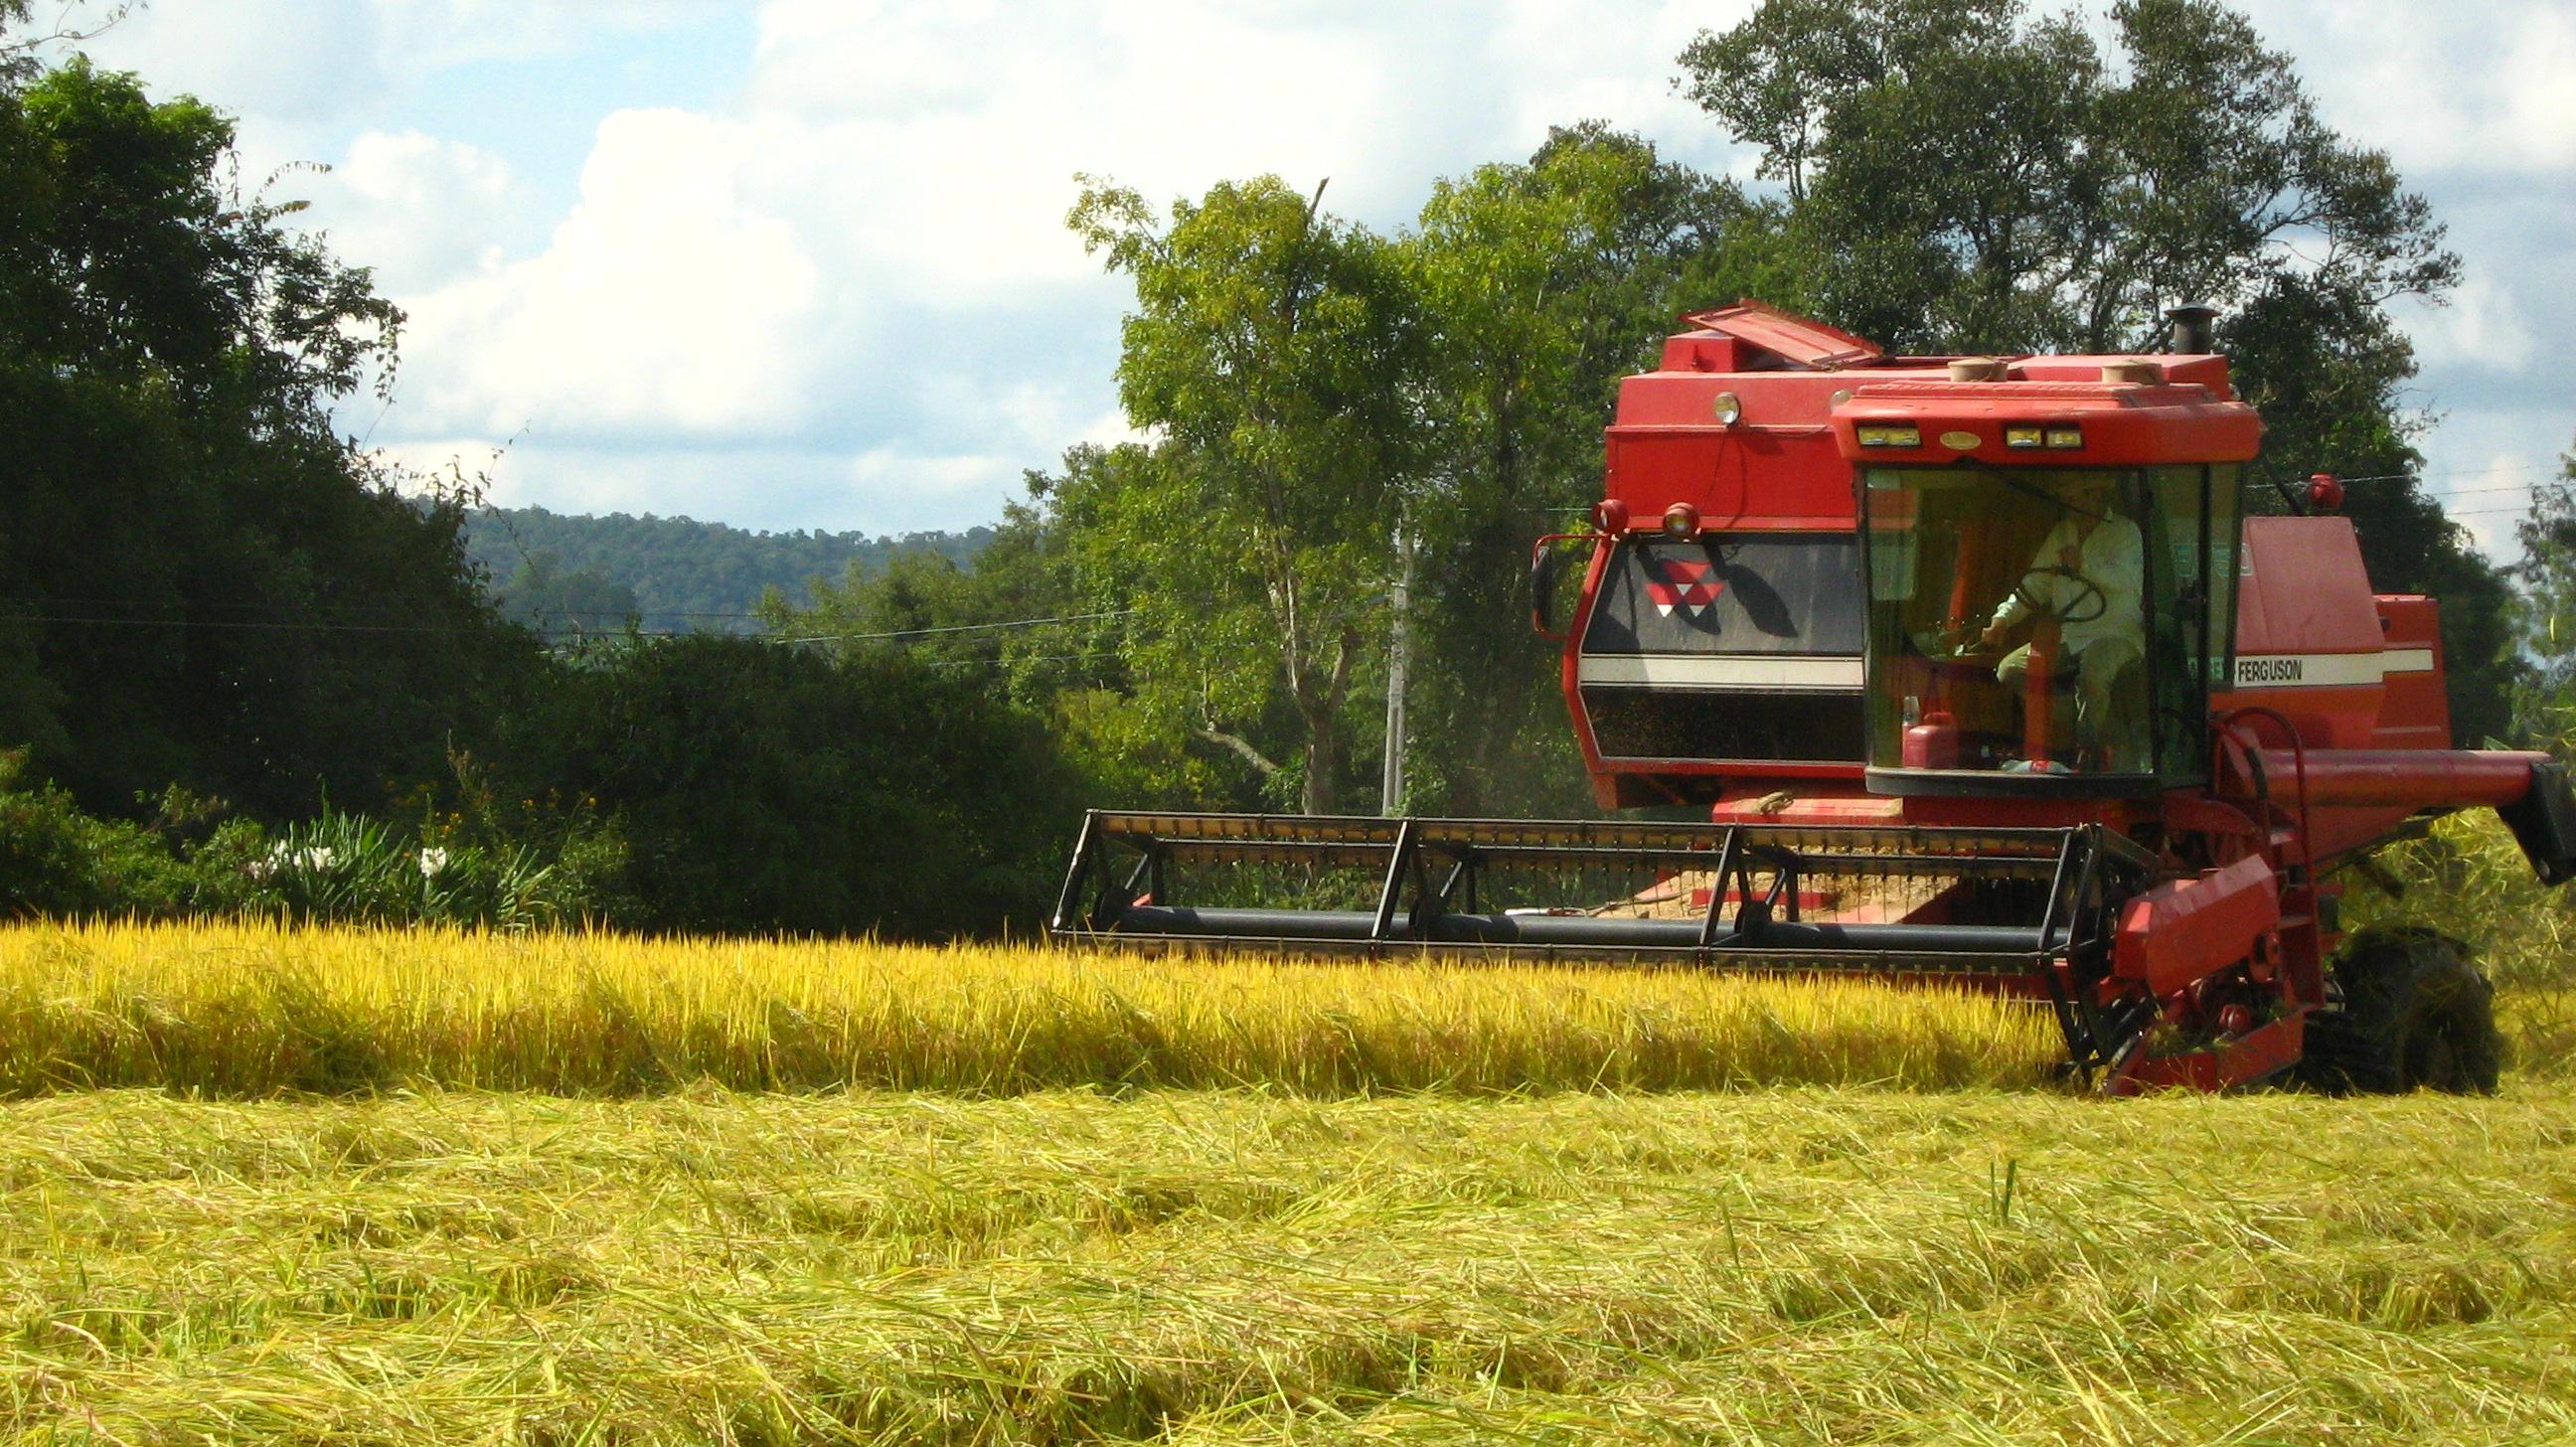 Plantación de arroz en Rio do Sul, Brasil